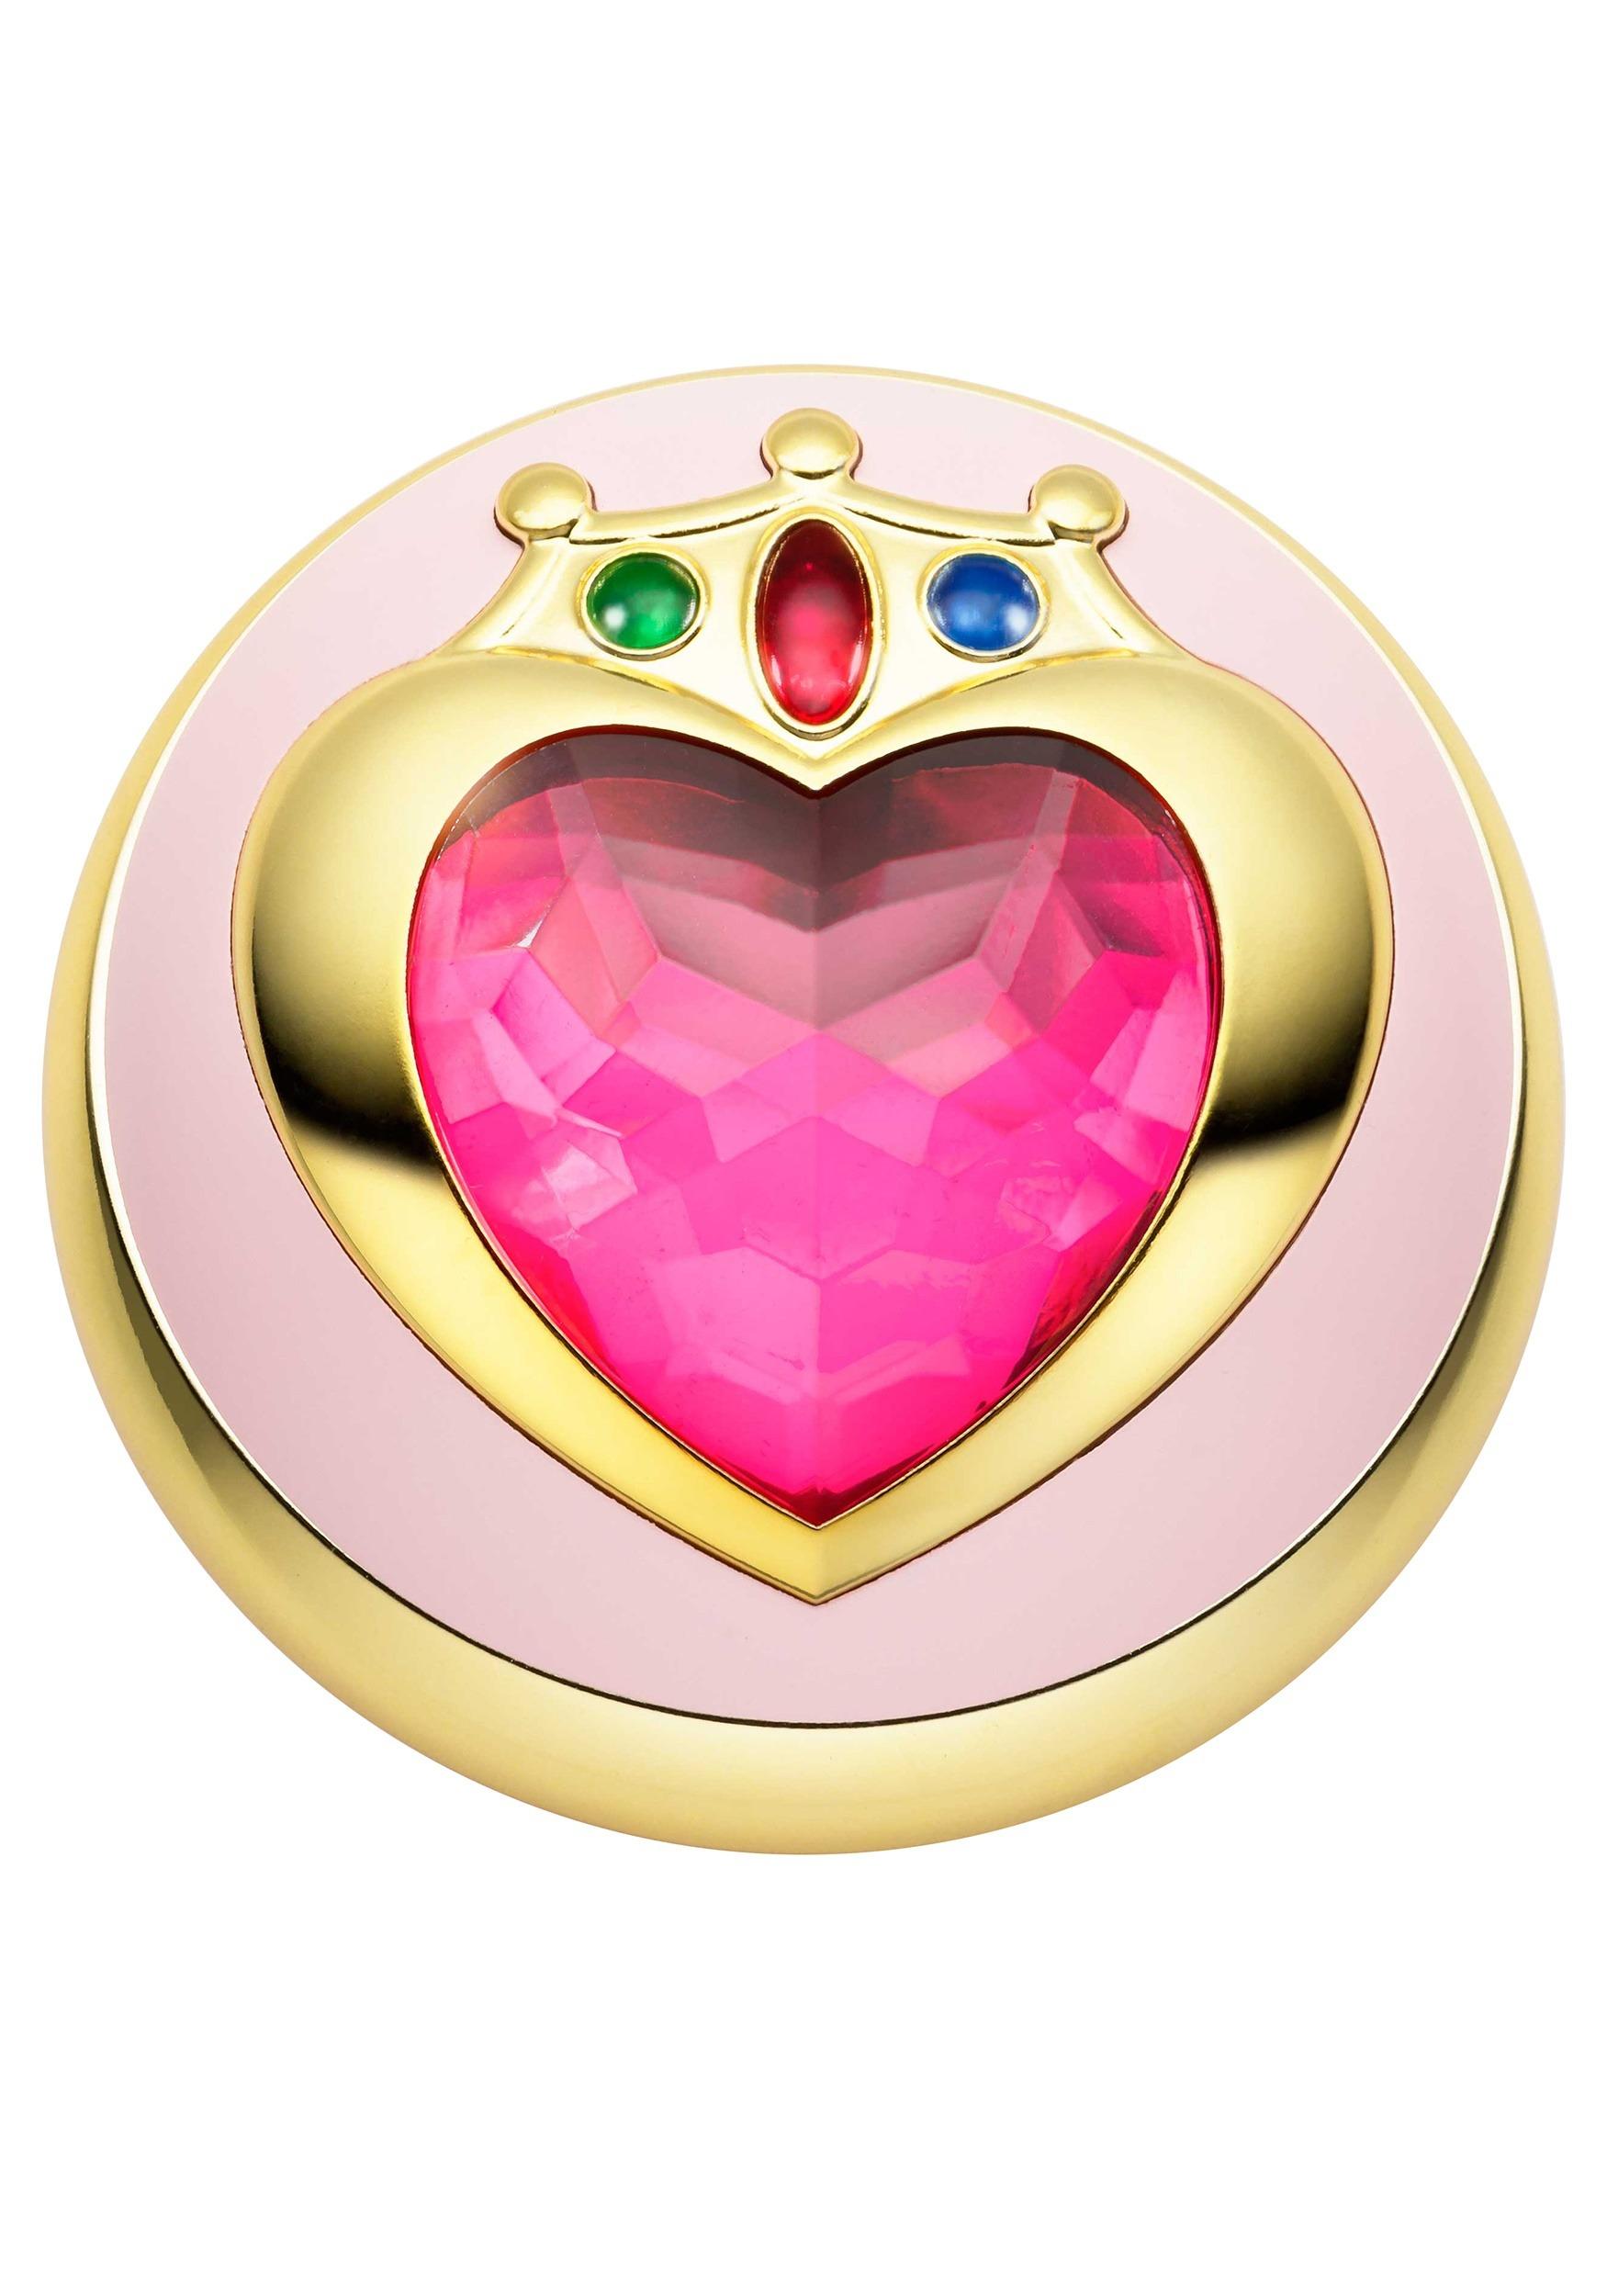 Bandai Proplica Sailor Chibi Moon Prism Heart Compact